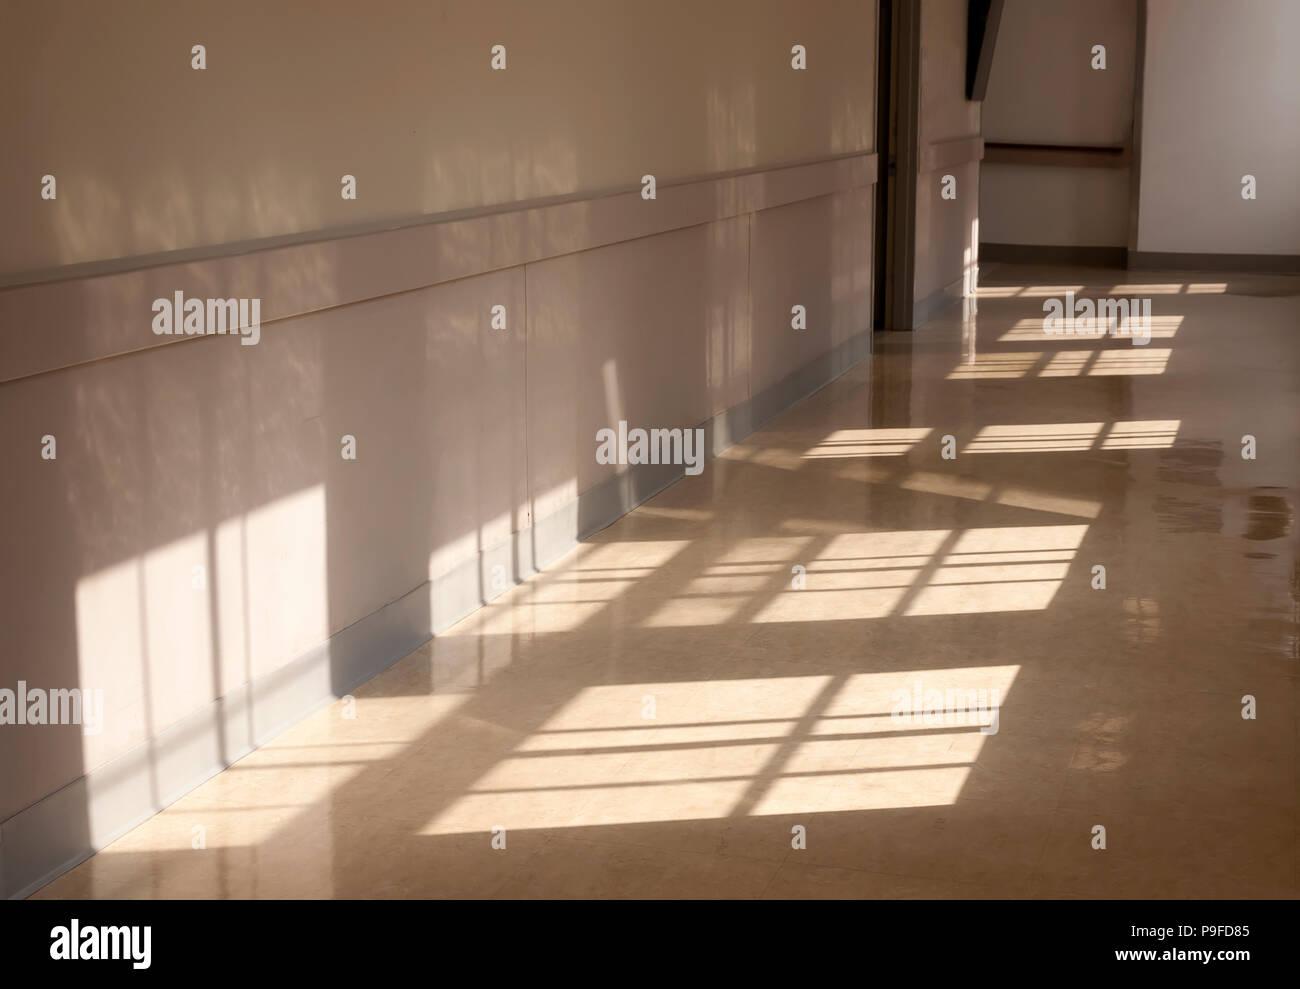 Sunlight shining through windows onto a hallway floor. - Stock Image